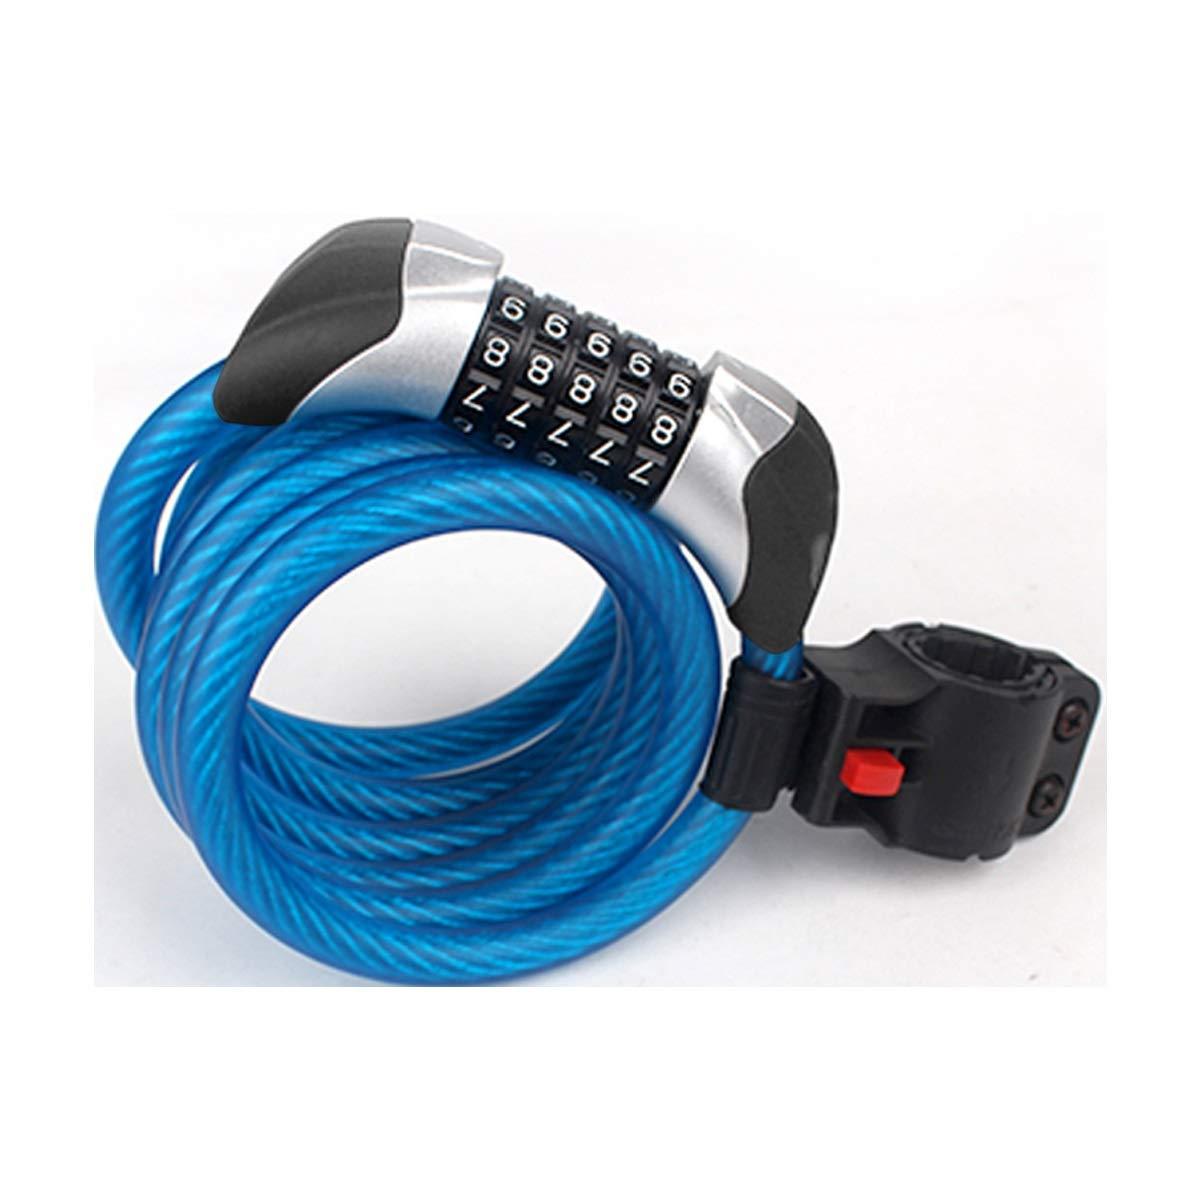 ZHONGYUE 1.8m Mountain Bike Lock, Bicycle Lock, Code Lock, Road Car Anti-Theft Equipment, Steel Cable Lock, Black, Purple, Blue (Color : Blue)